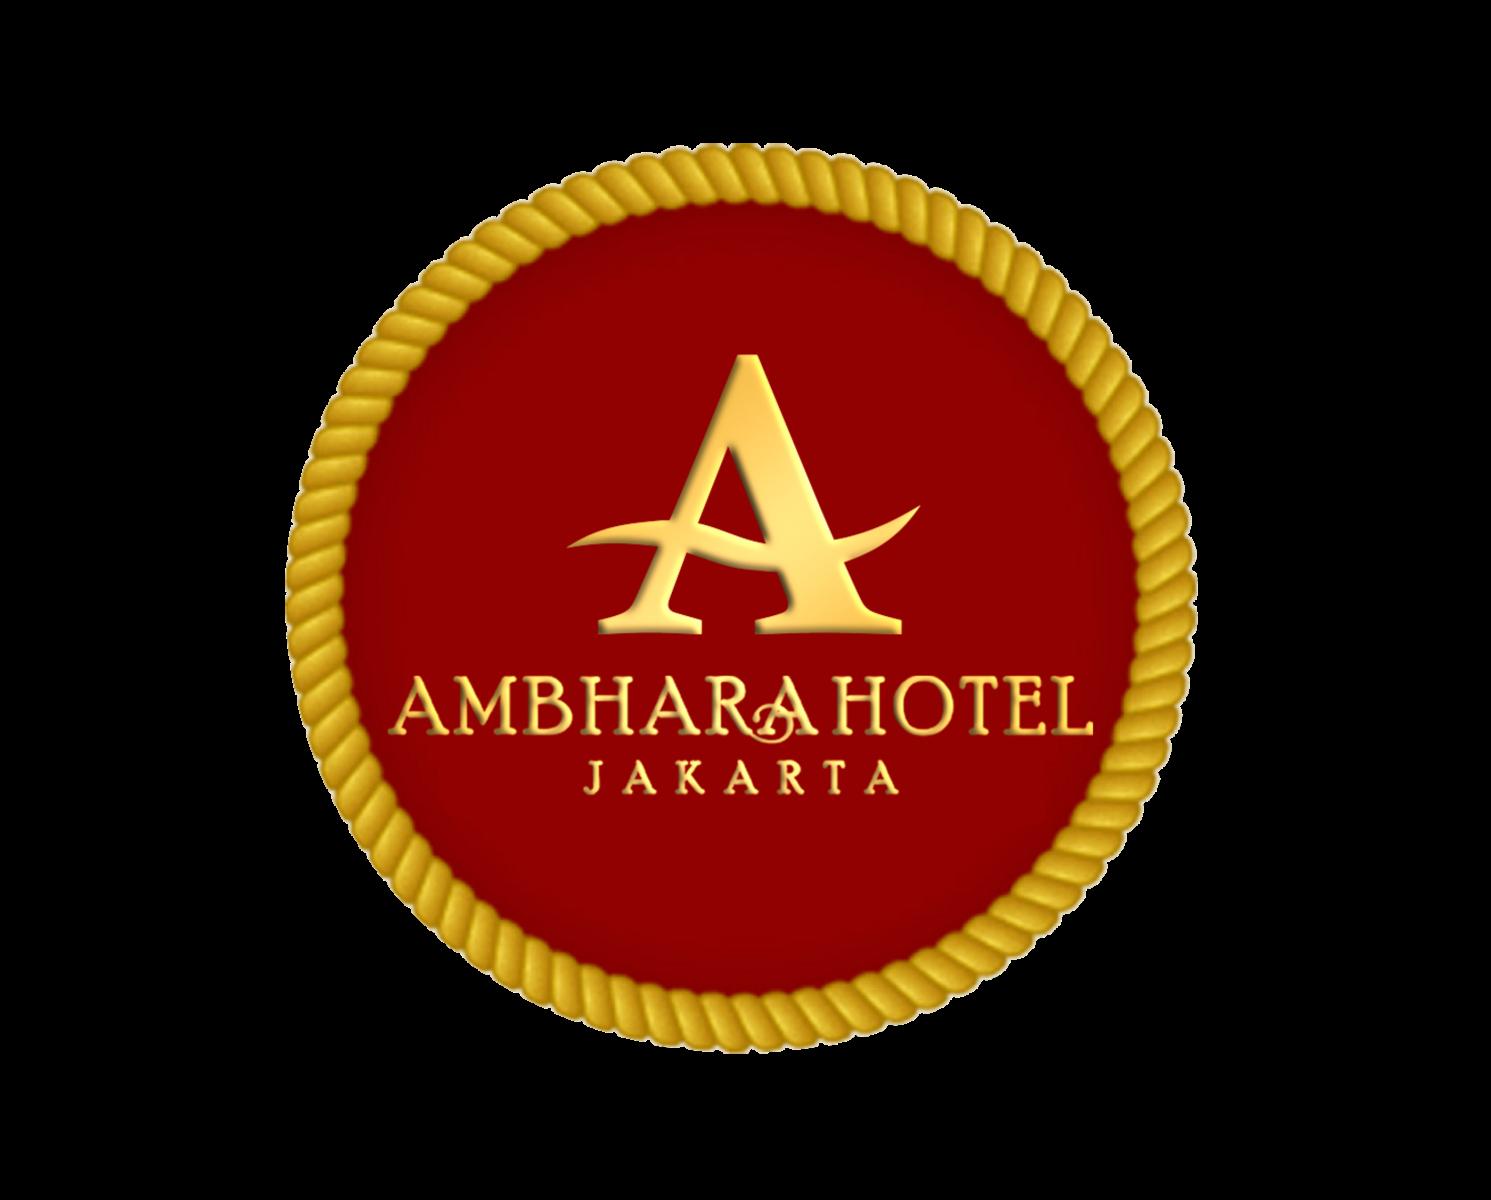 Ambhara Hotel Jakarta, 4 Star Business Hotel in Jakarta | Official